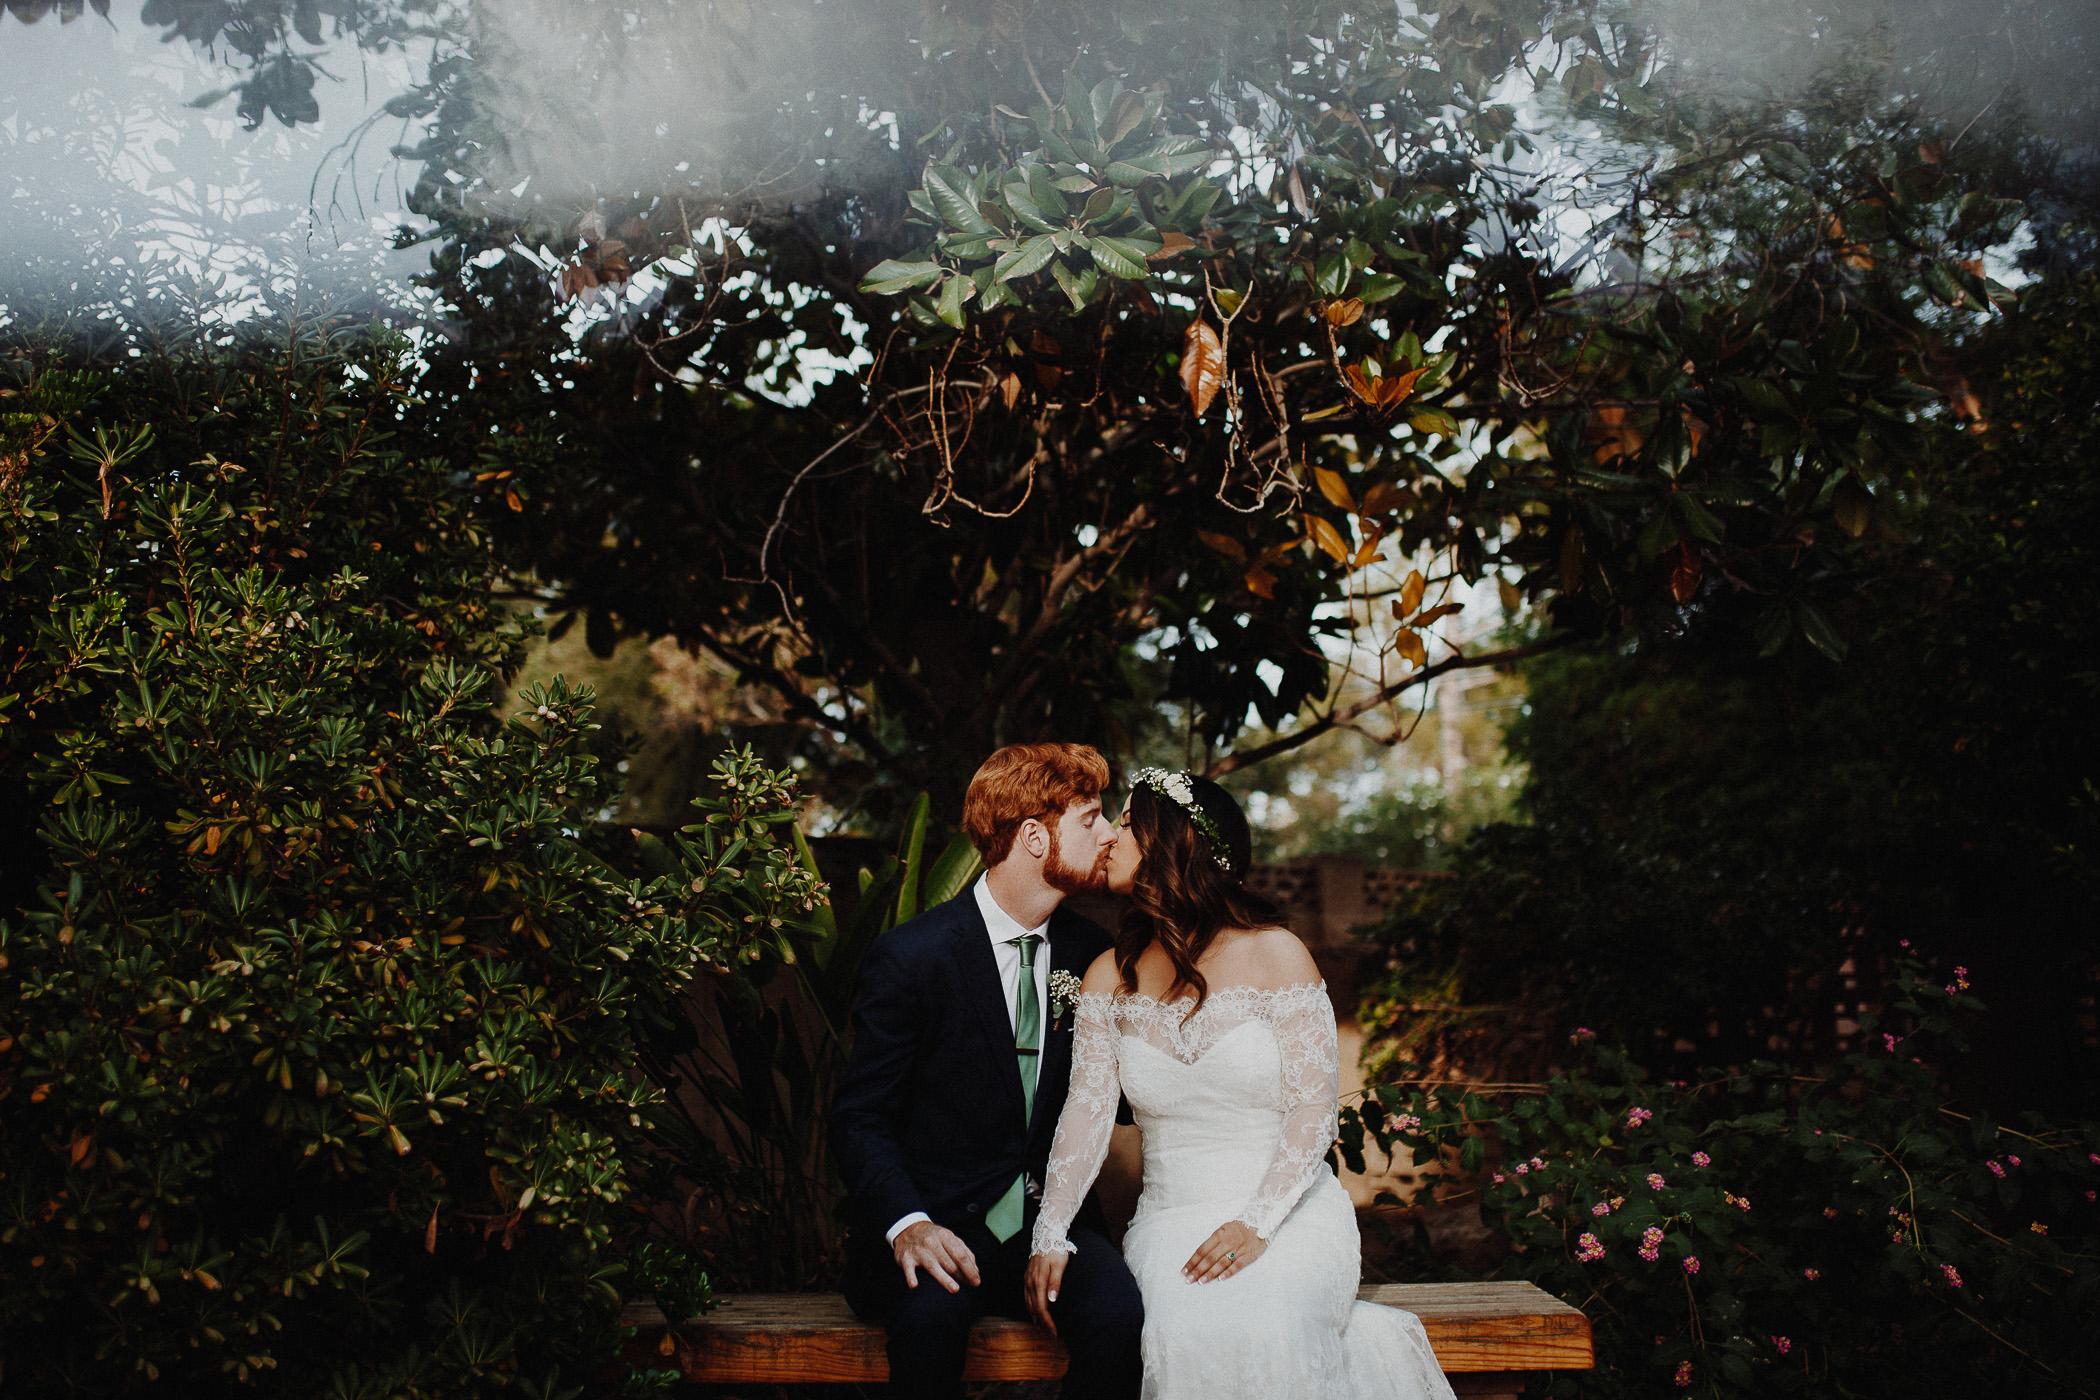 181104-Luxium-Weddings-Arizona-@matt__Le-Brandon-Kariana-Phoenix-Valley-Garden-Center-1100.jpg